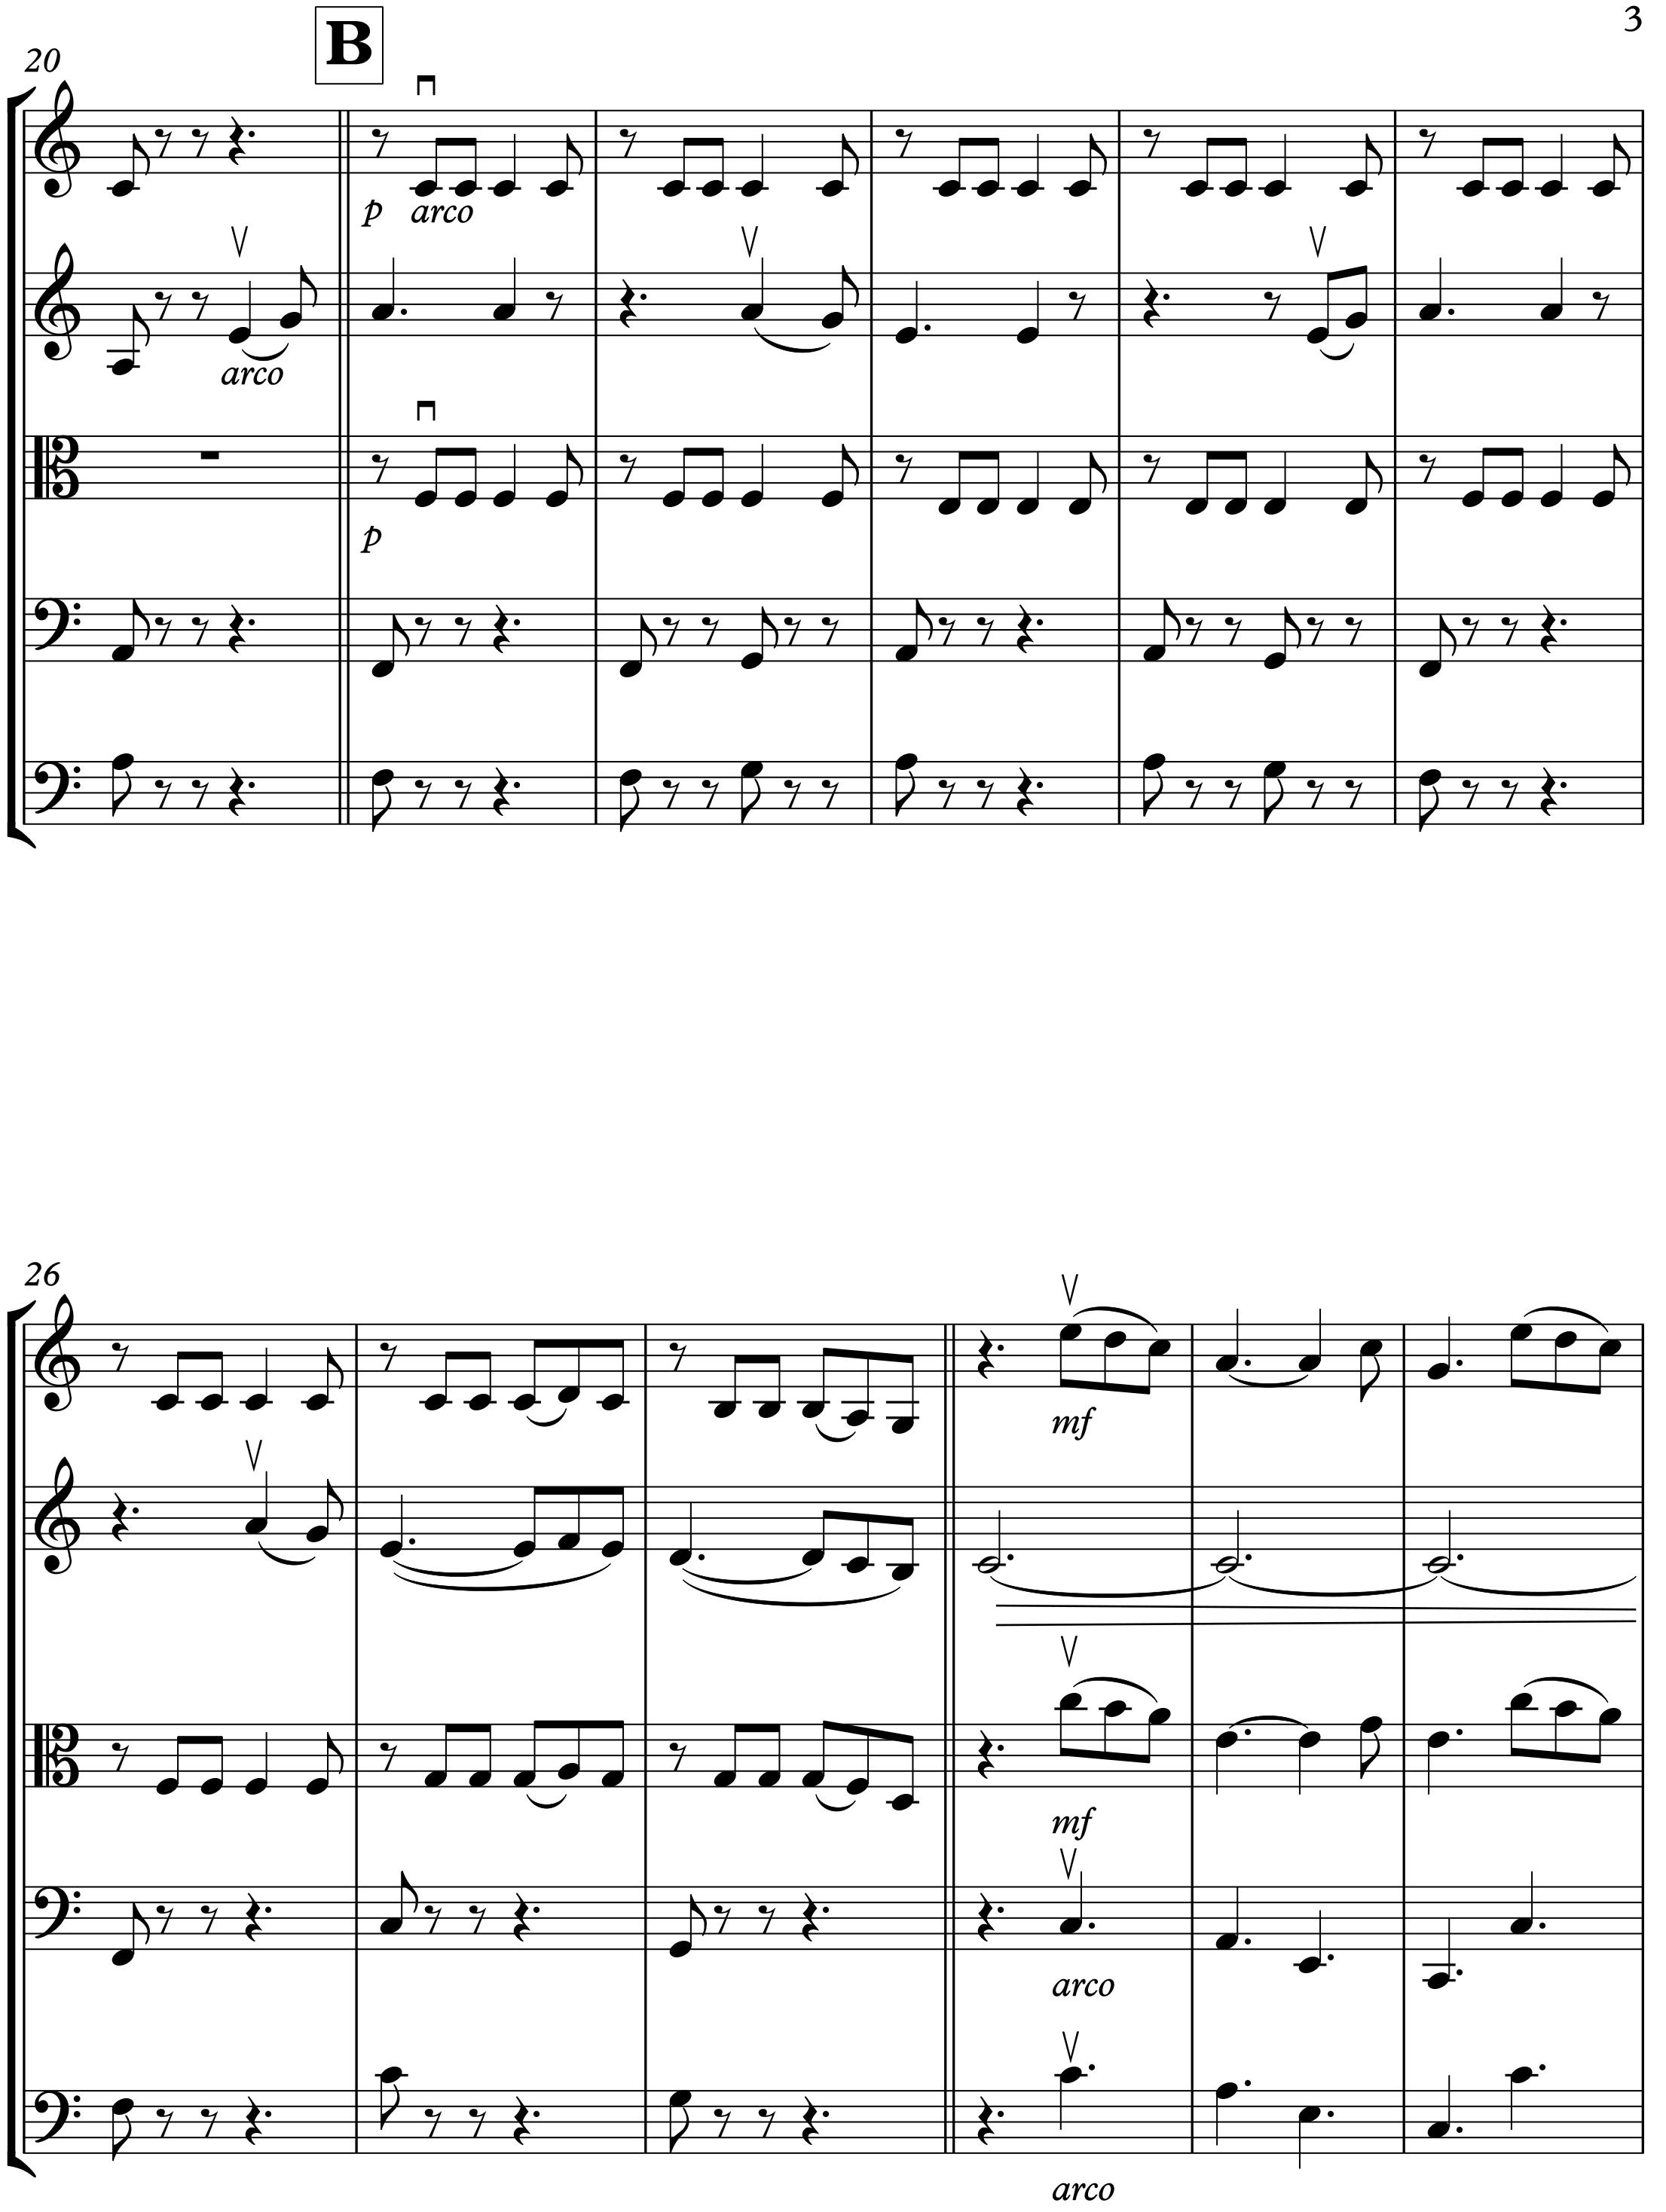 Hallelujah - Full Score-3.jpg